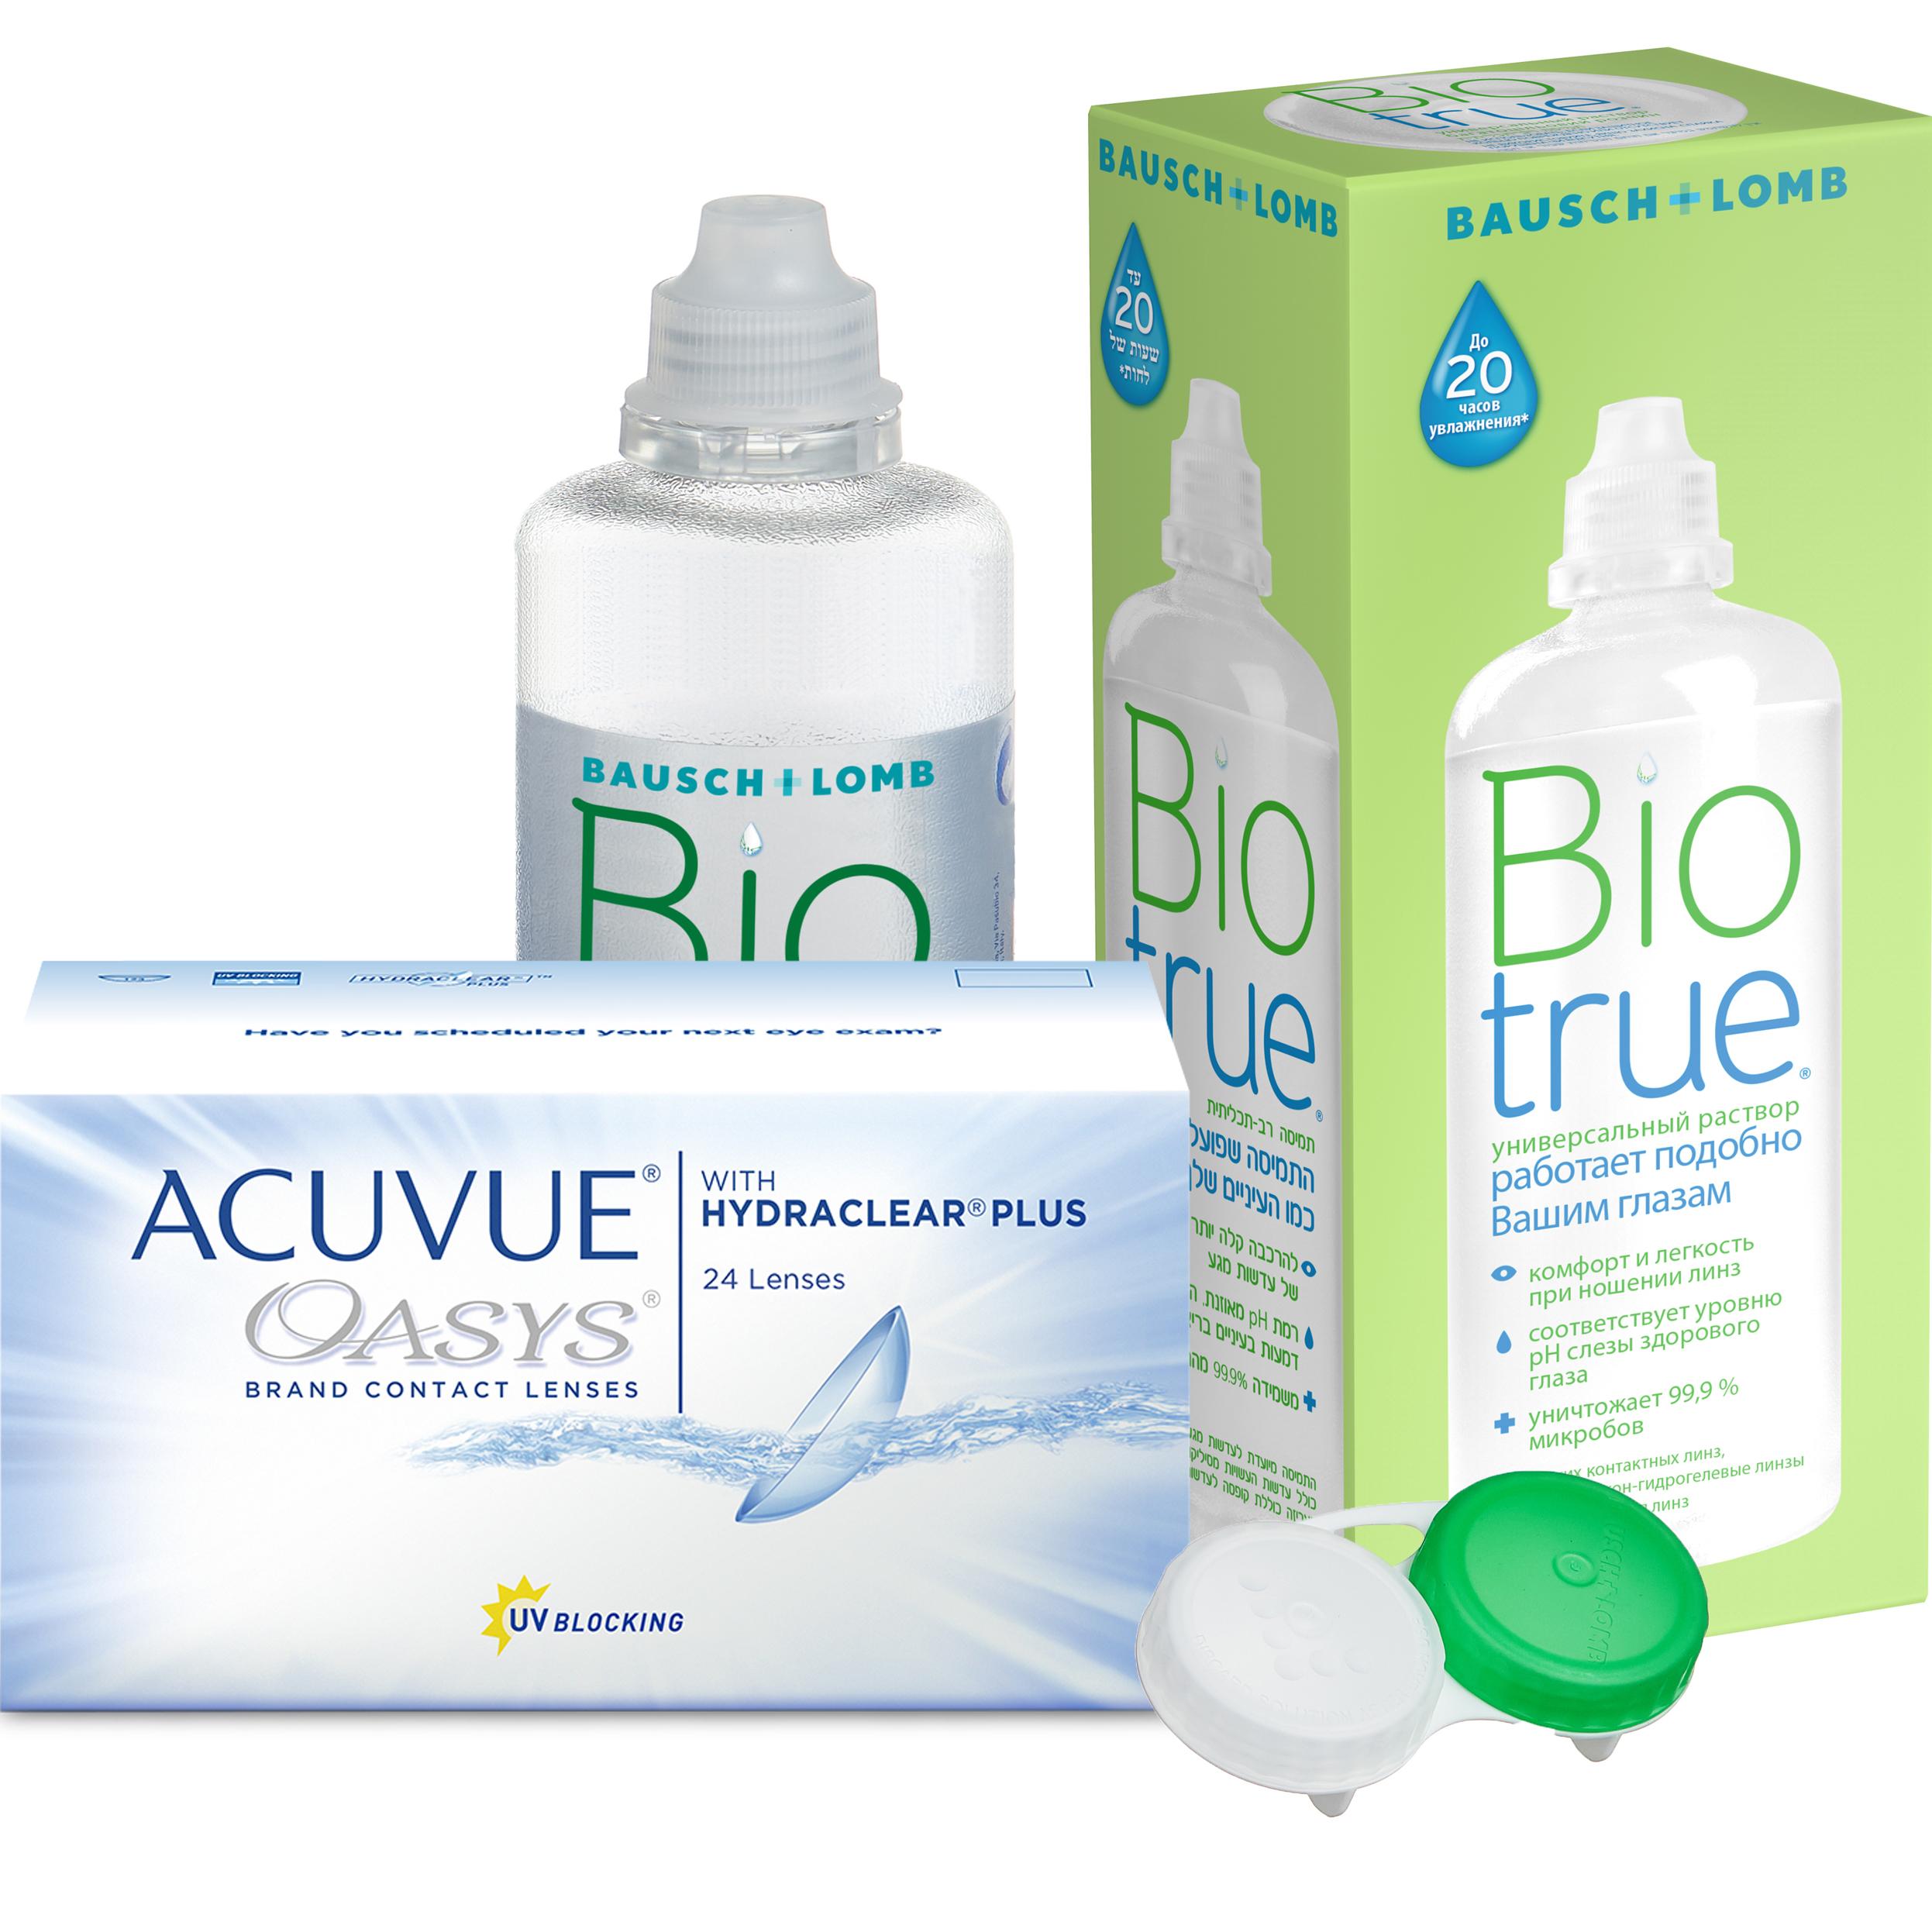 Купить Oasys with Hydraclear Plus 24 линзы + Biotrue, Контактные линзы Acuvue Oasys with Hydraclear Plus 24 линзы R 8.8 -4, 50 + Biotrue 300 мл